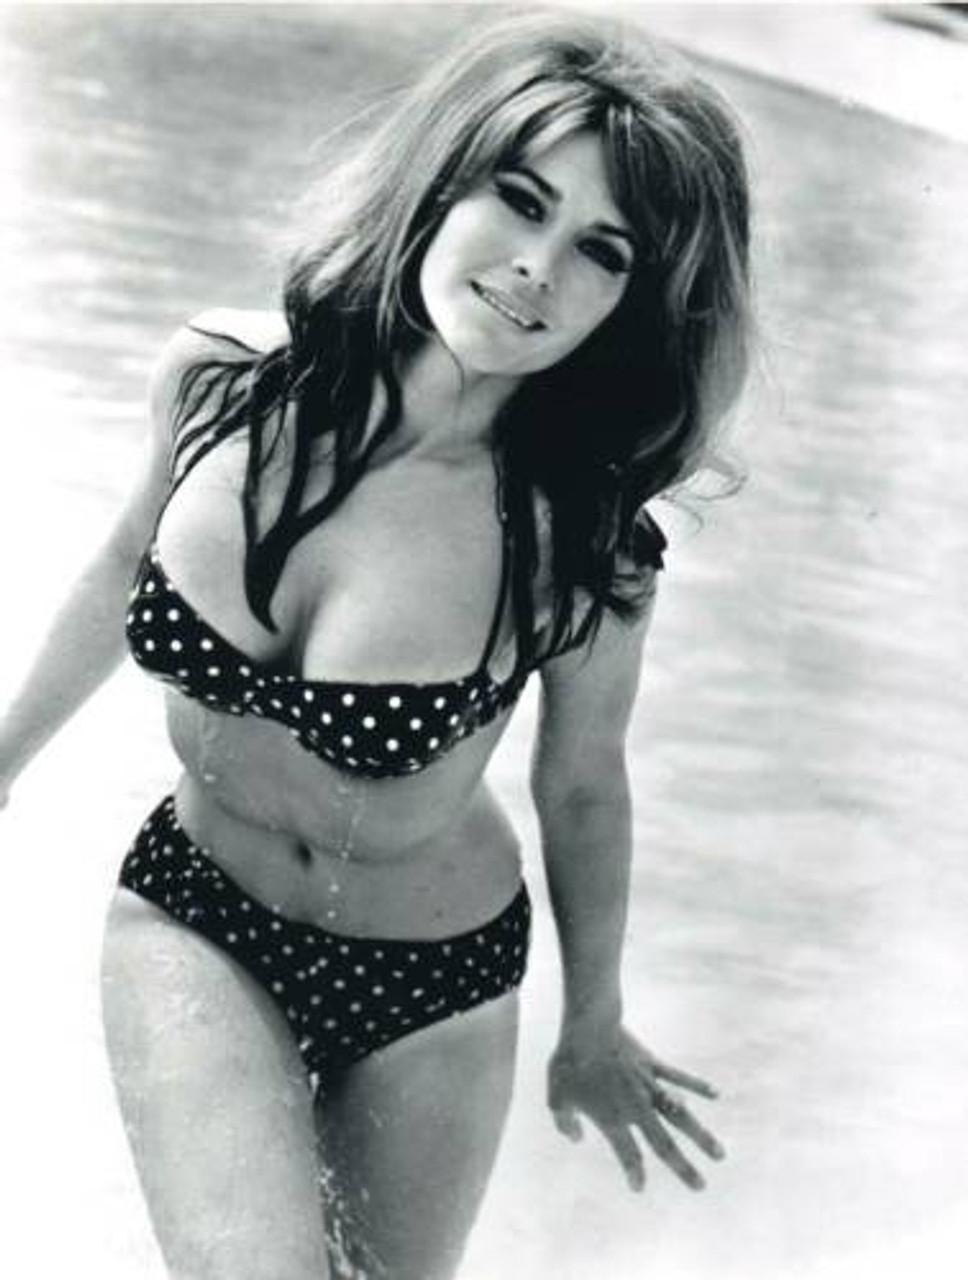 Michele Carey - Black and White Polka Dot Bikini Photo Print (8 x 10) -  Item # DAP18874 - Posterazzi